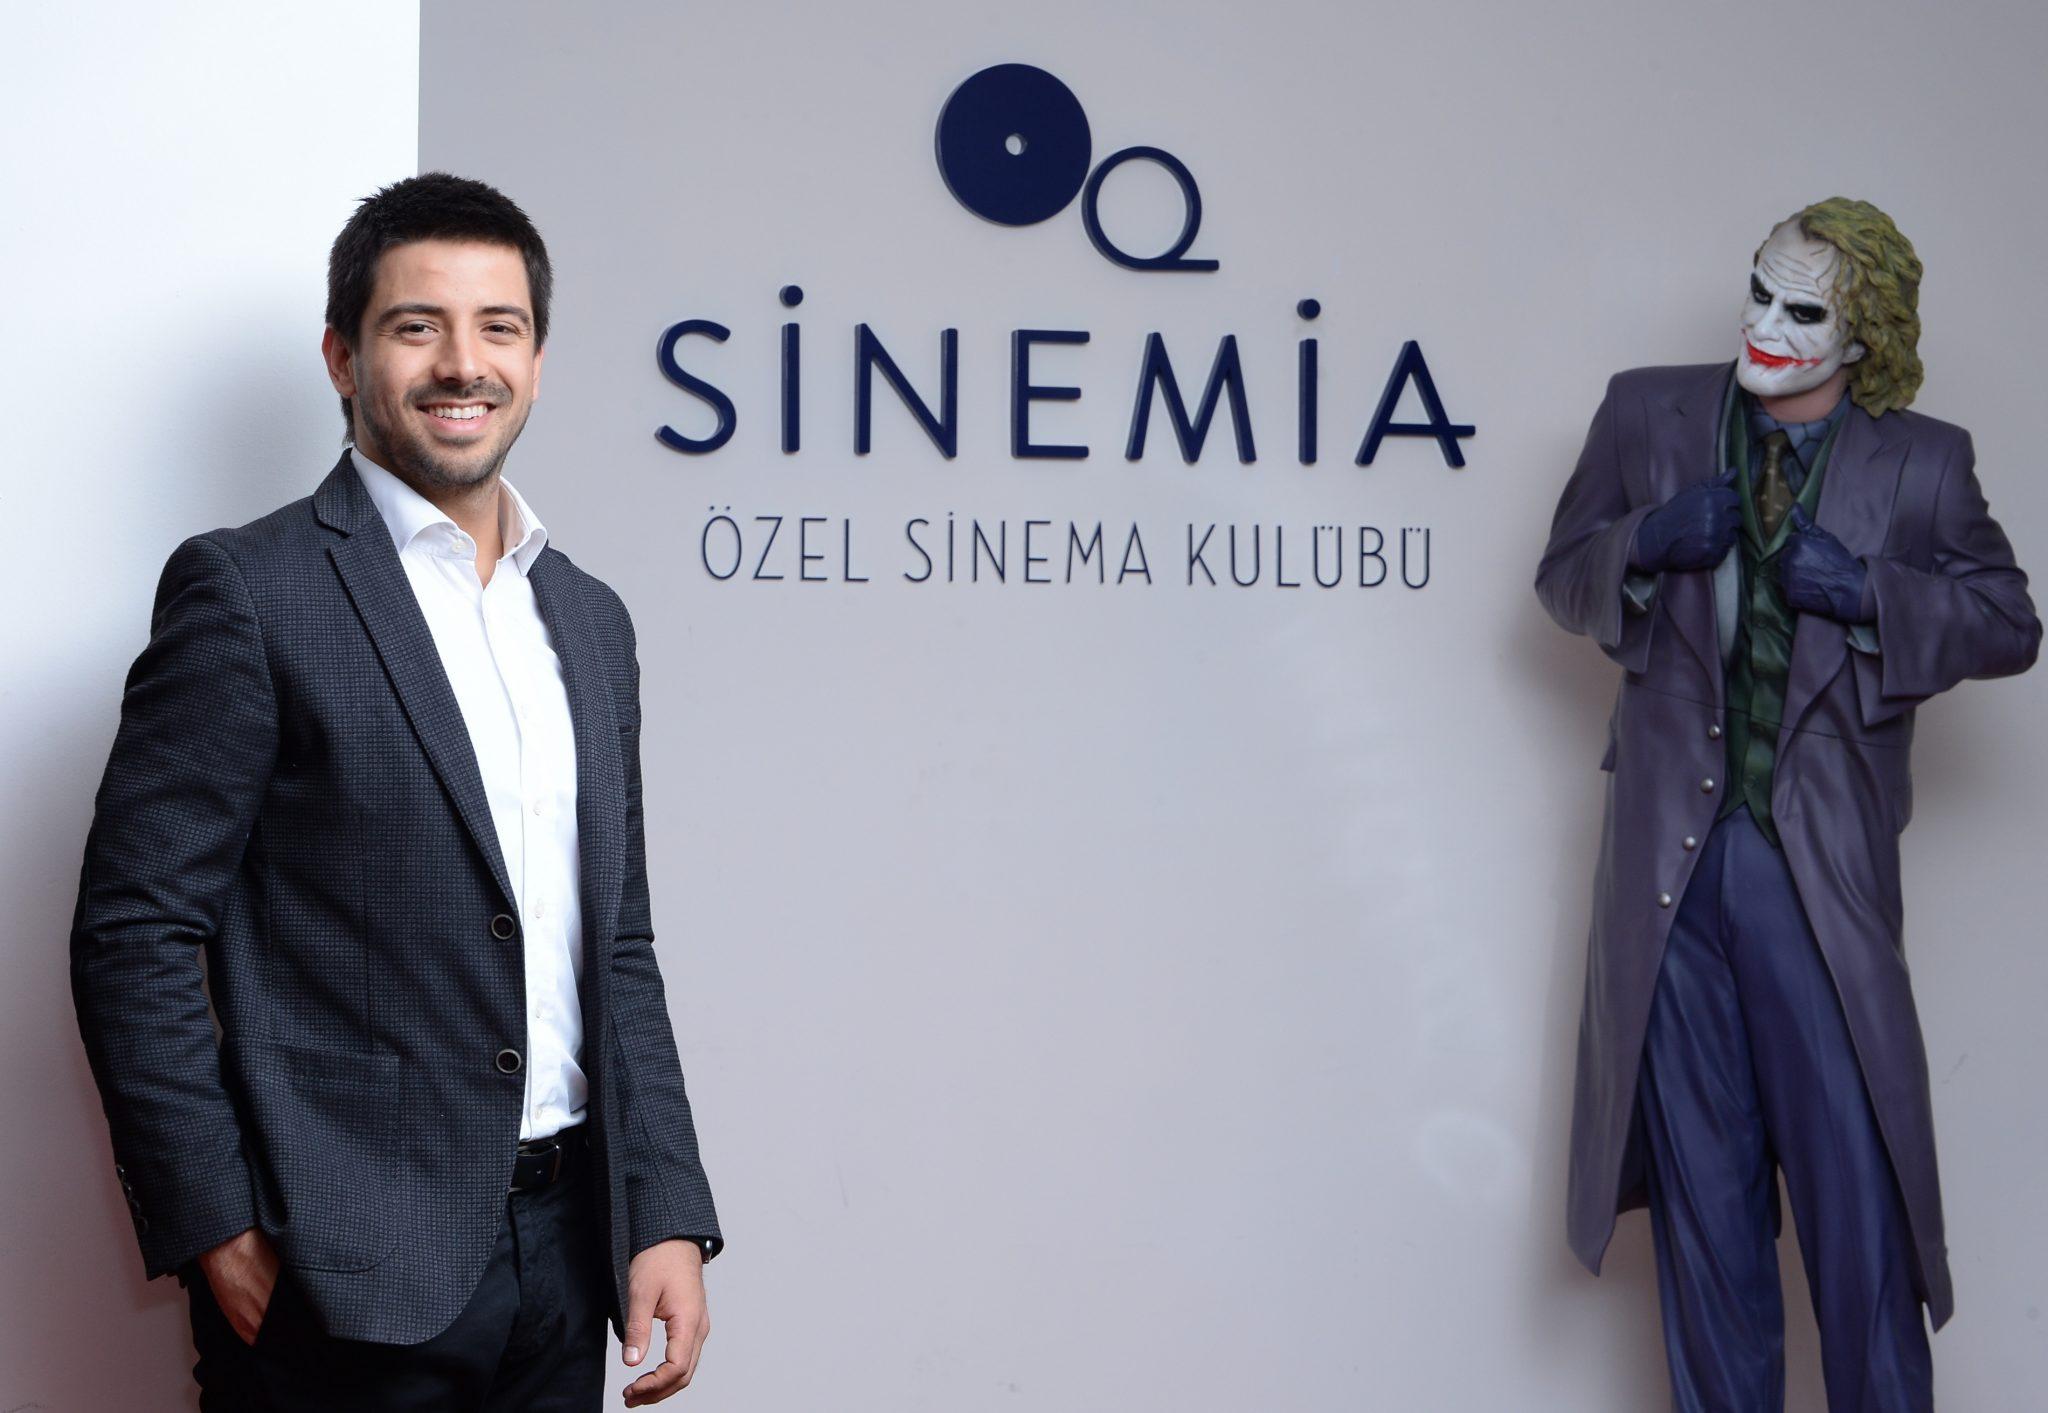 sinemia1